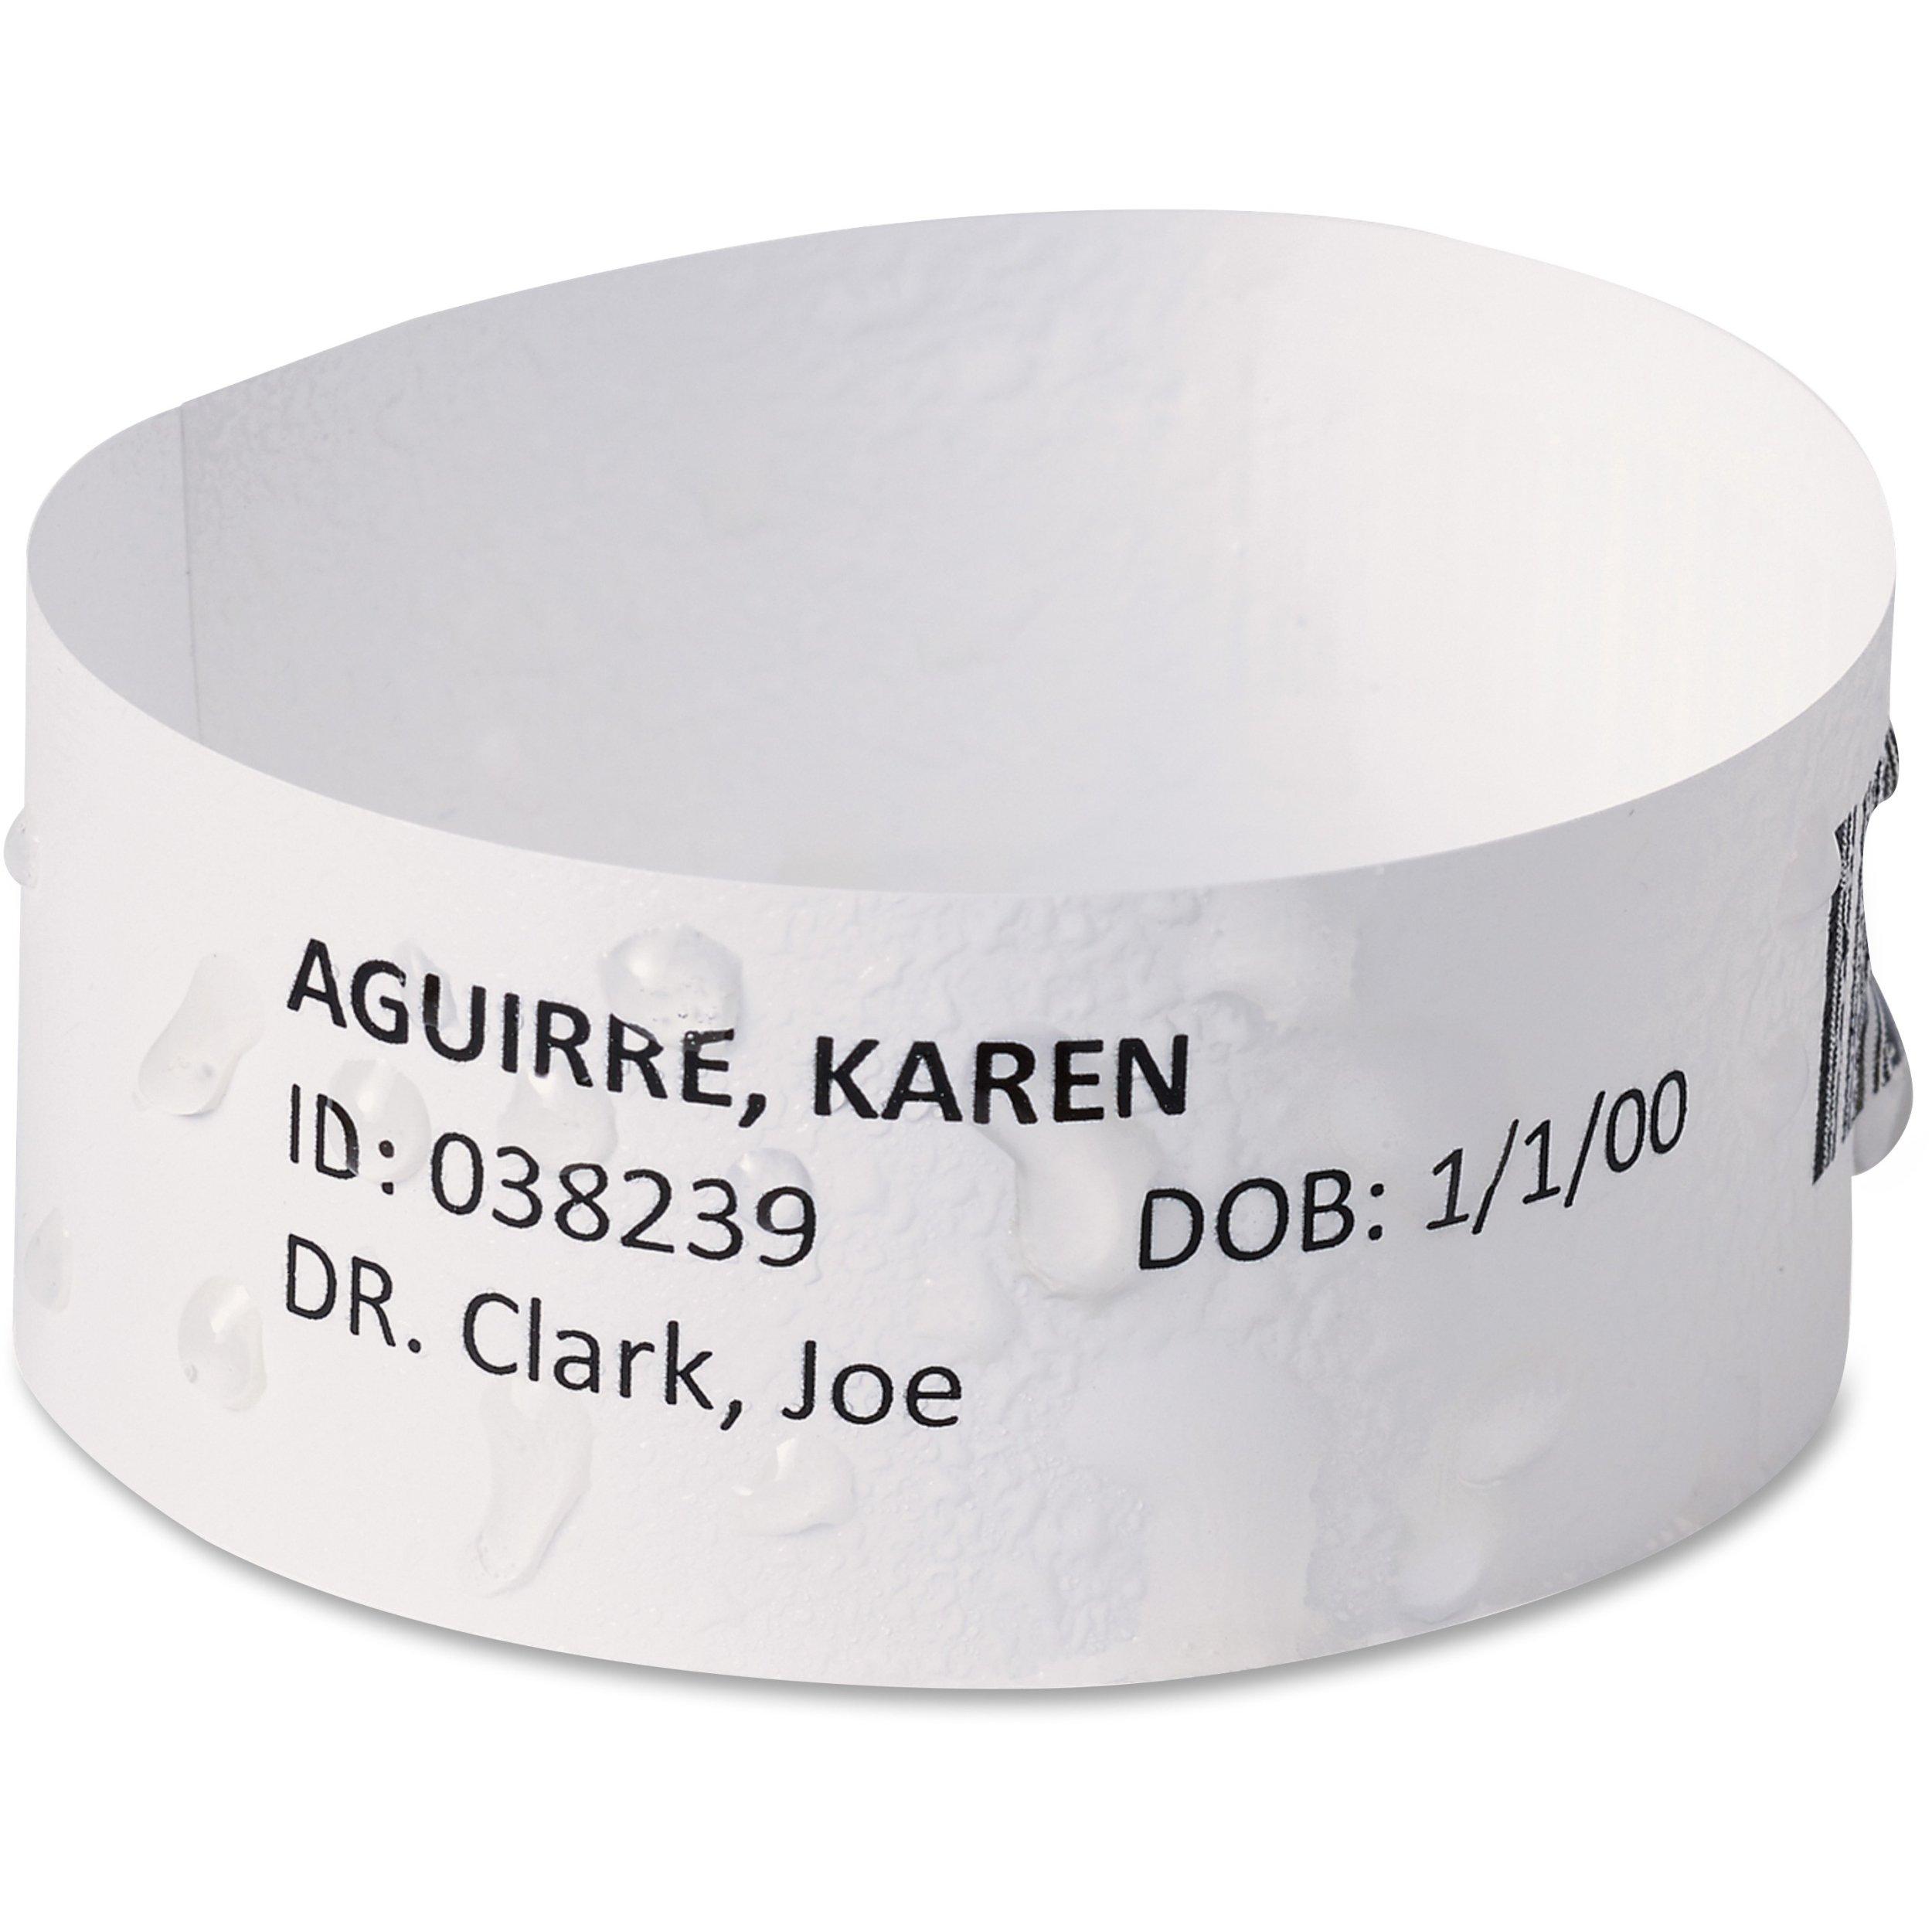 Avery Chart Label EasyBand Medical Wristbands 74436